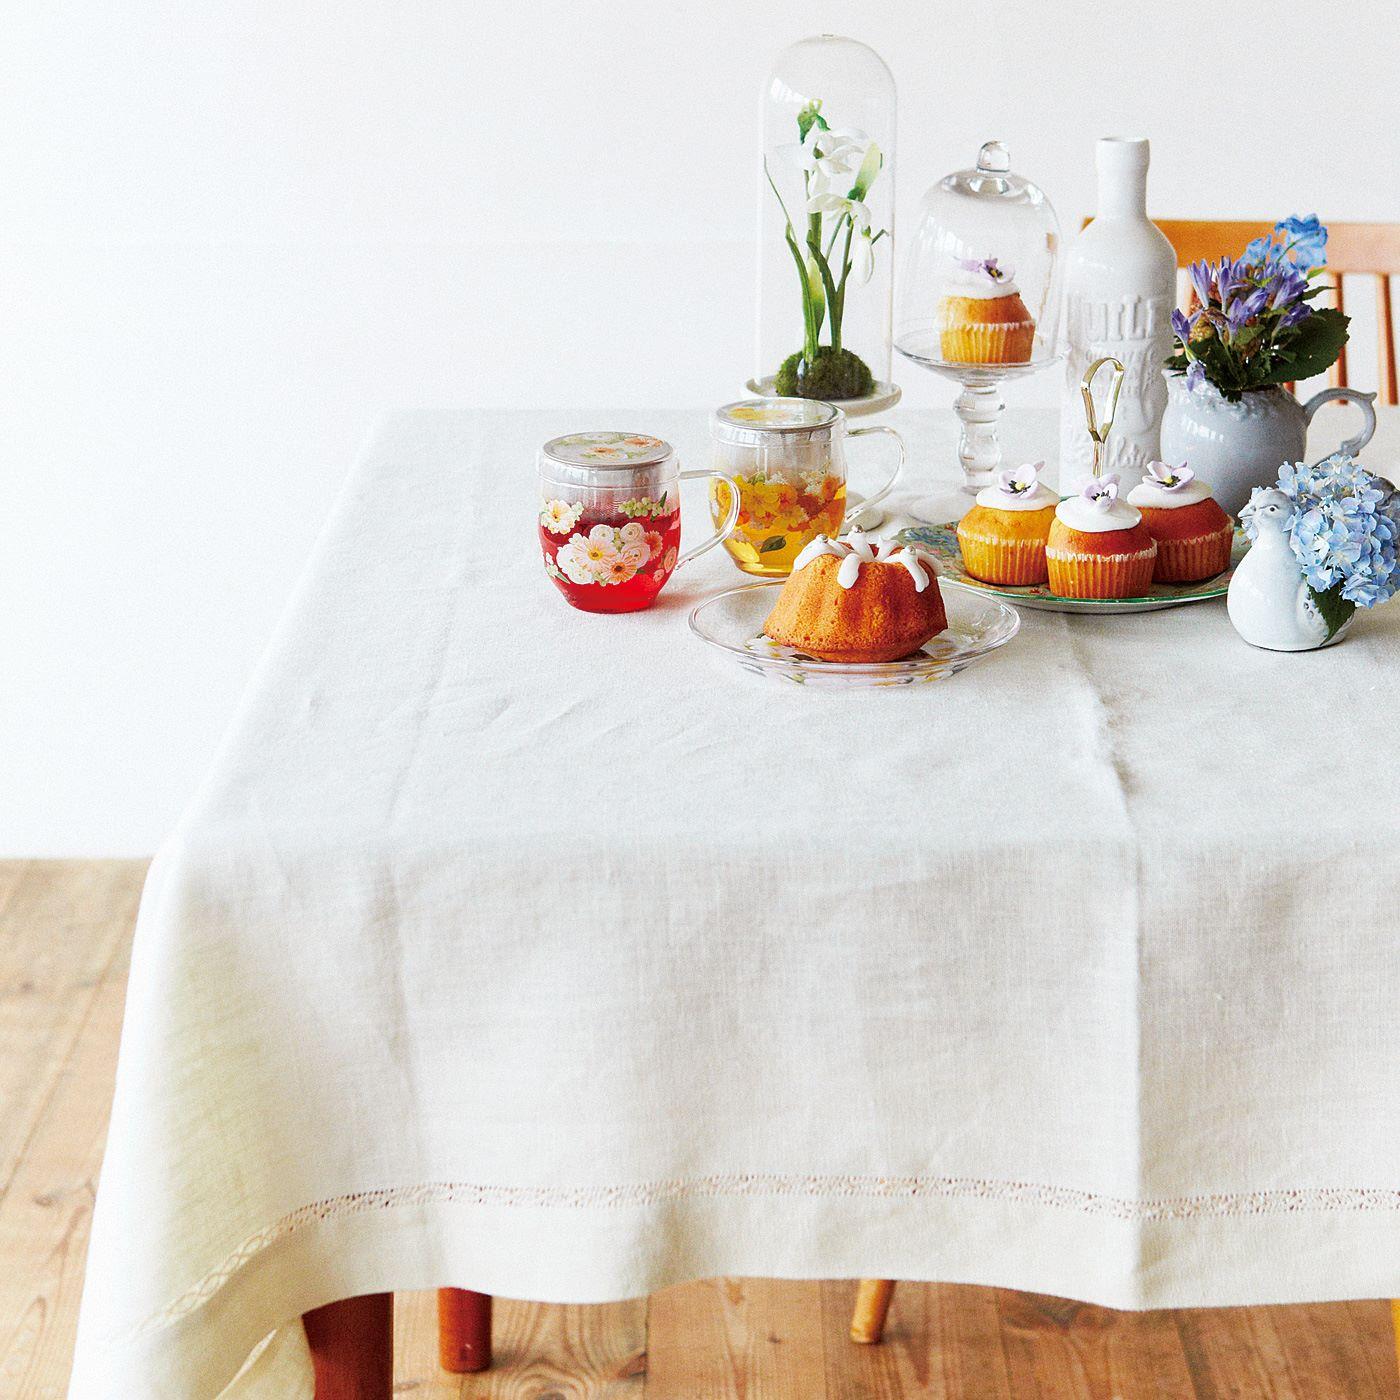 【Before】いつものテーブルが……